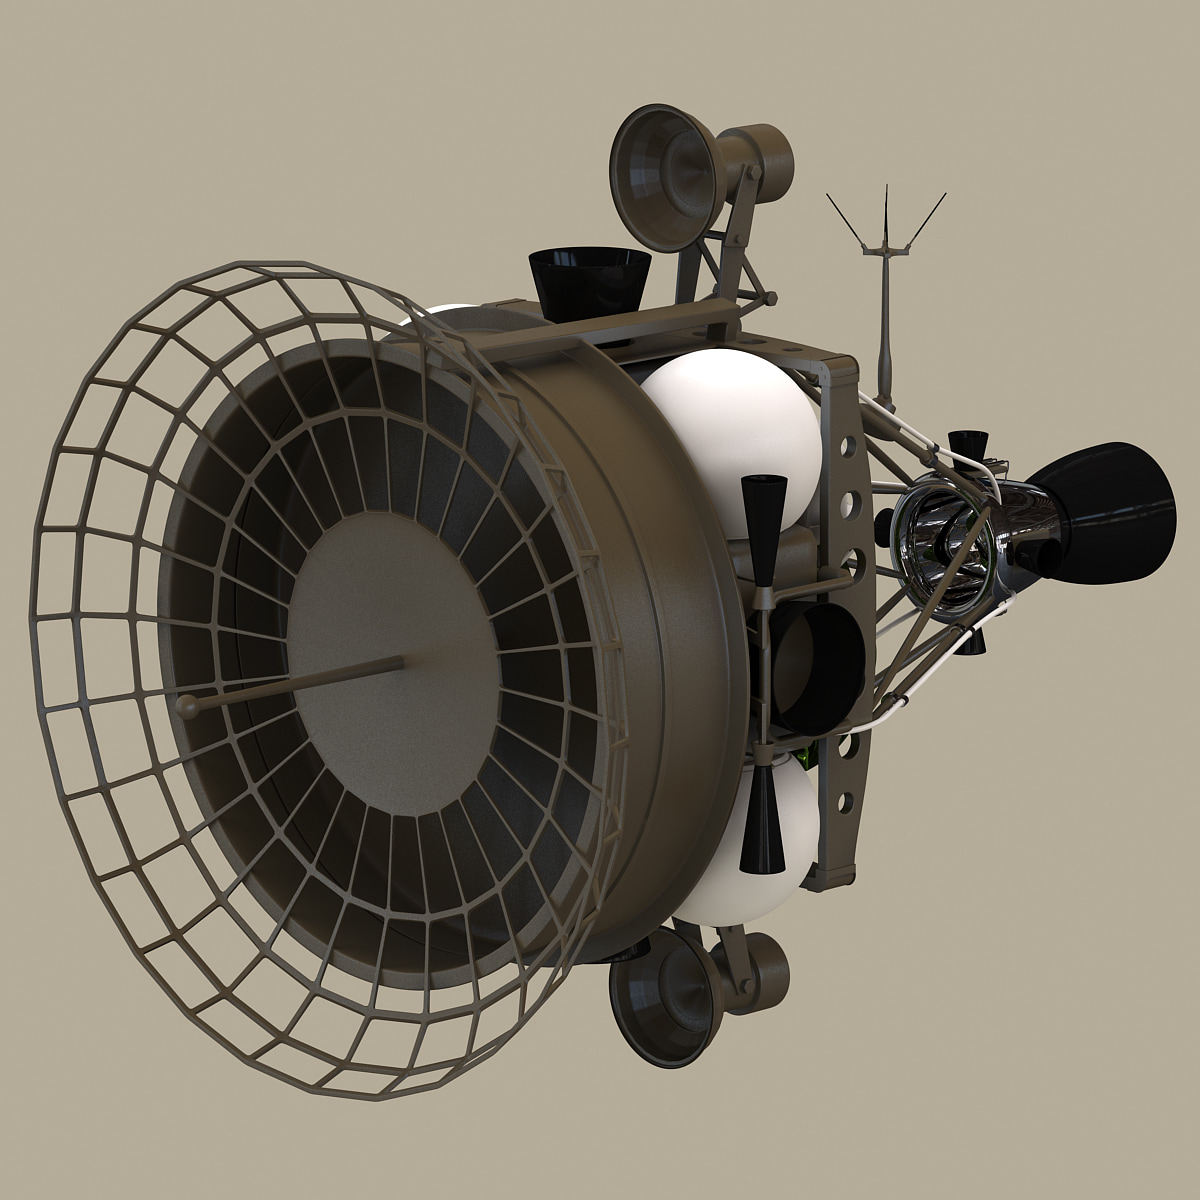 Military_Anti-Satellite_System_Target_Satellite_001.jpg